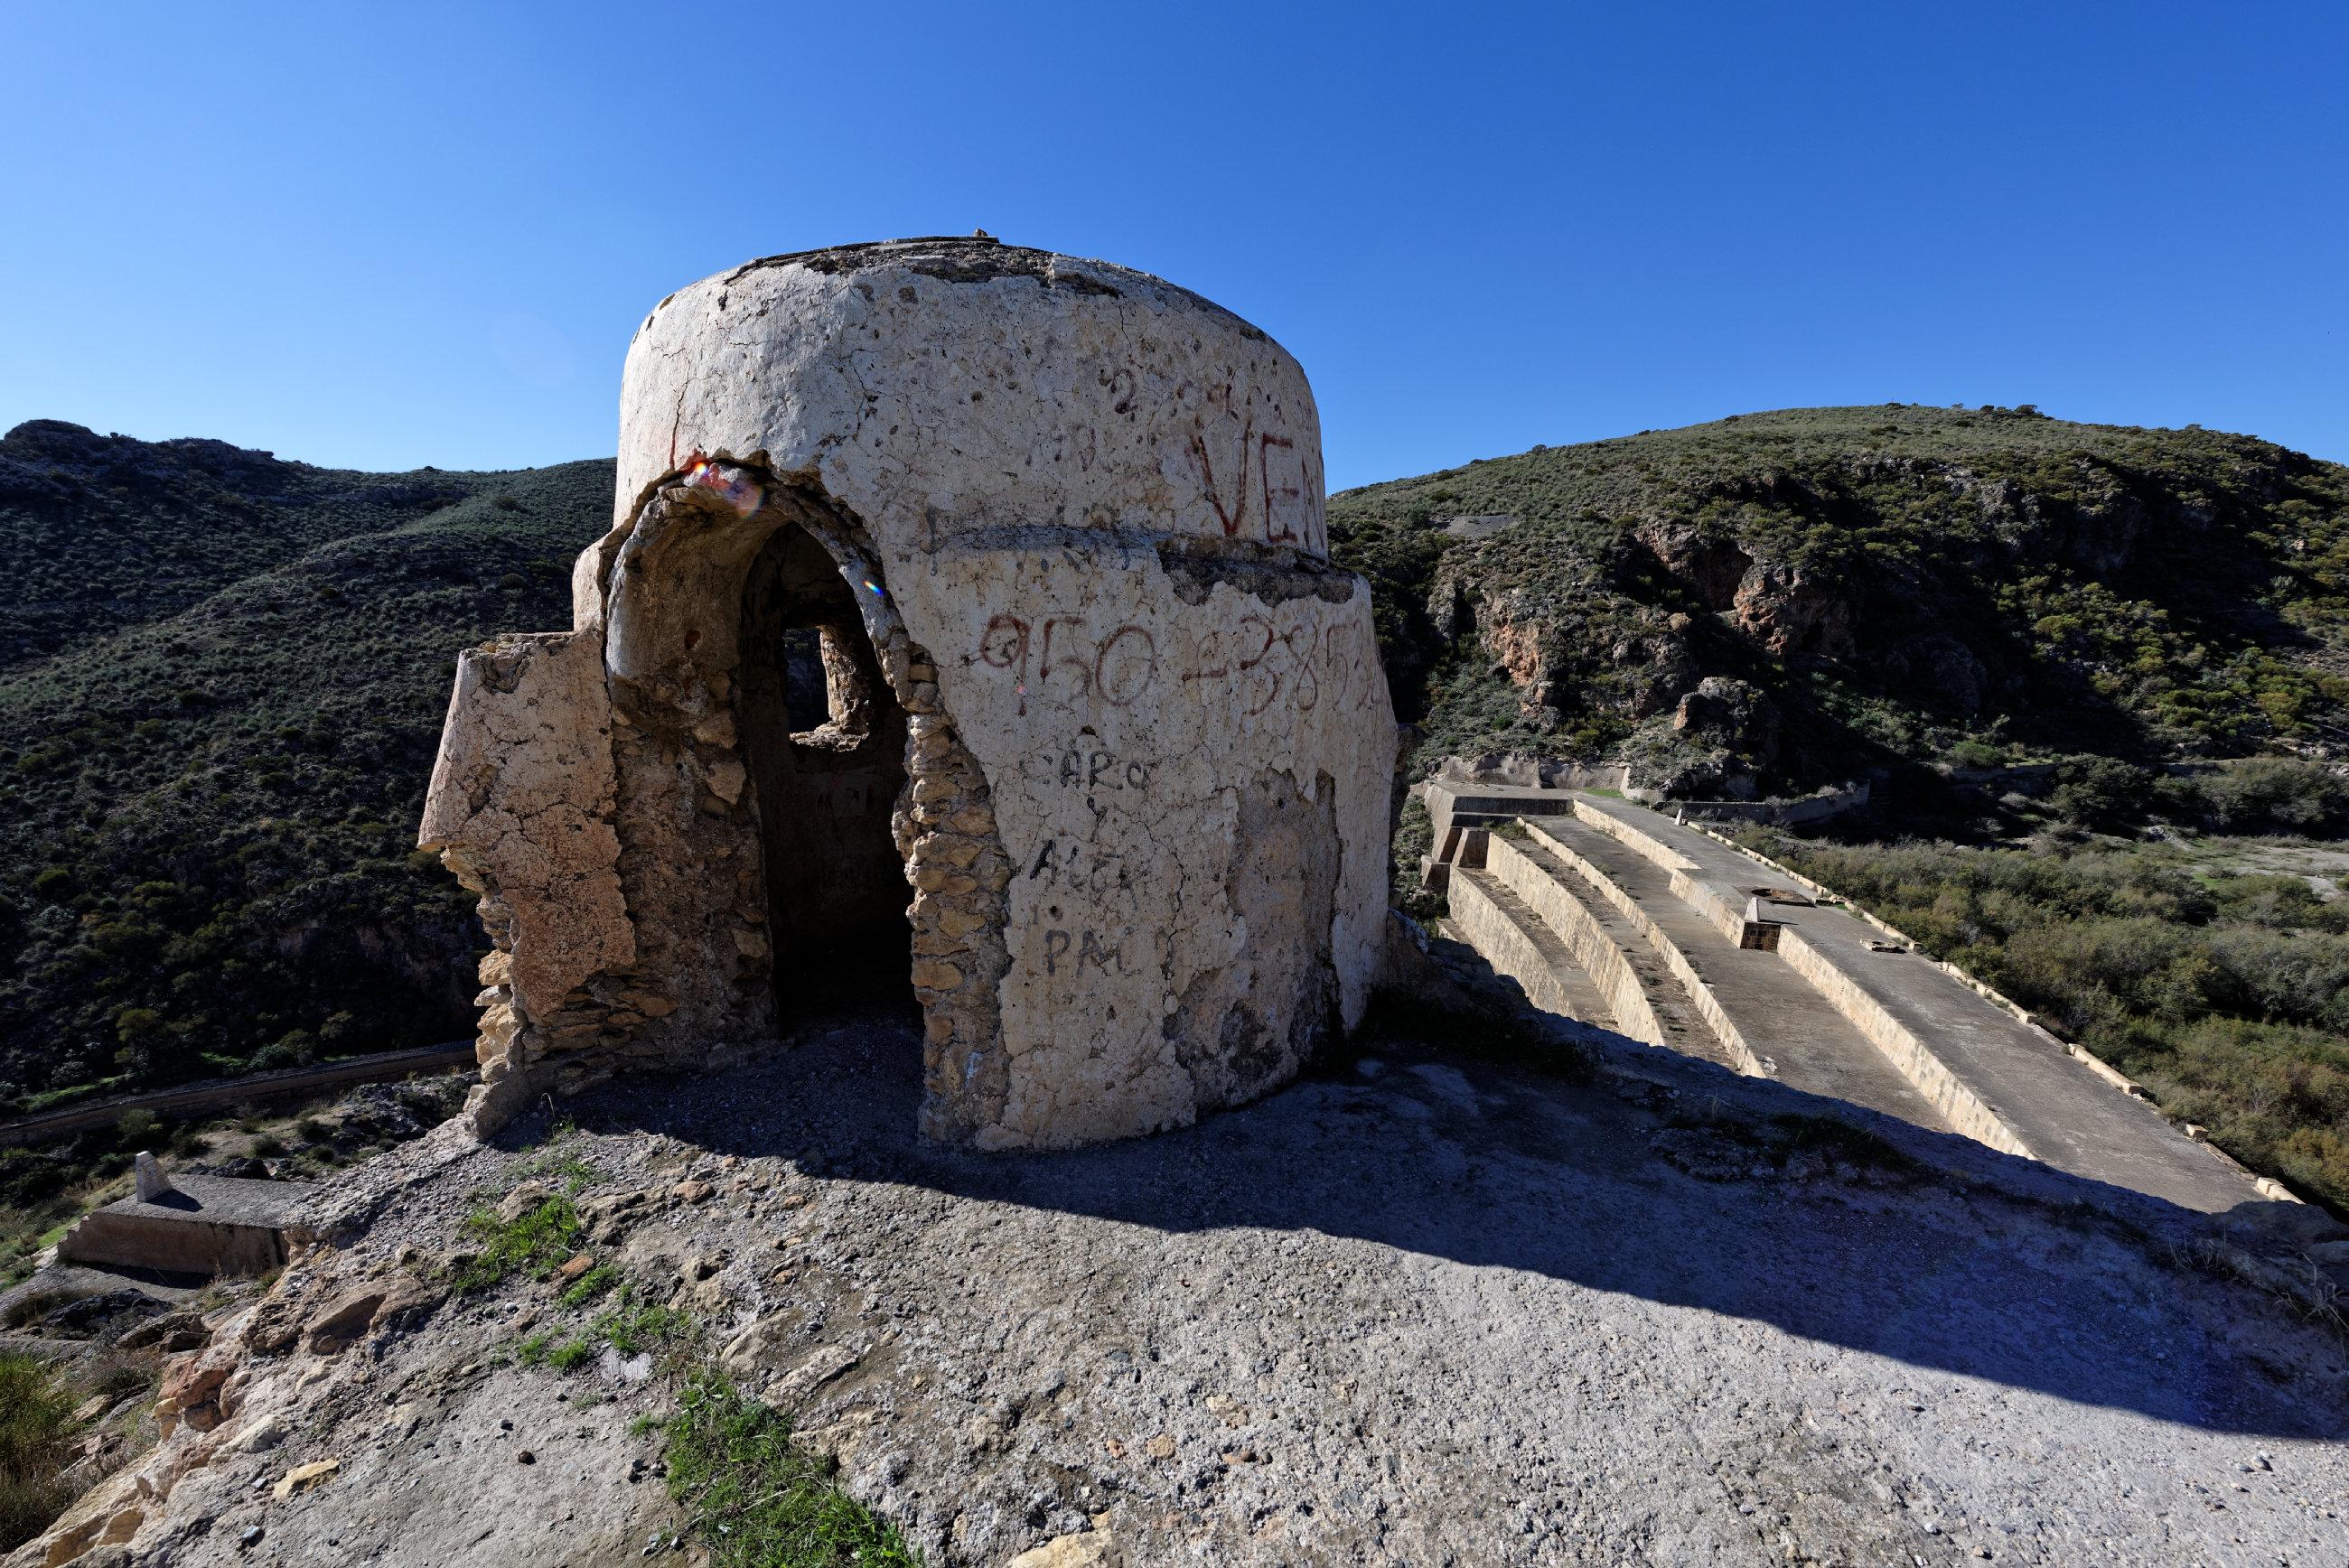 151107-Nijar - Embalse Isabel II - Barrage du 19eme (107)